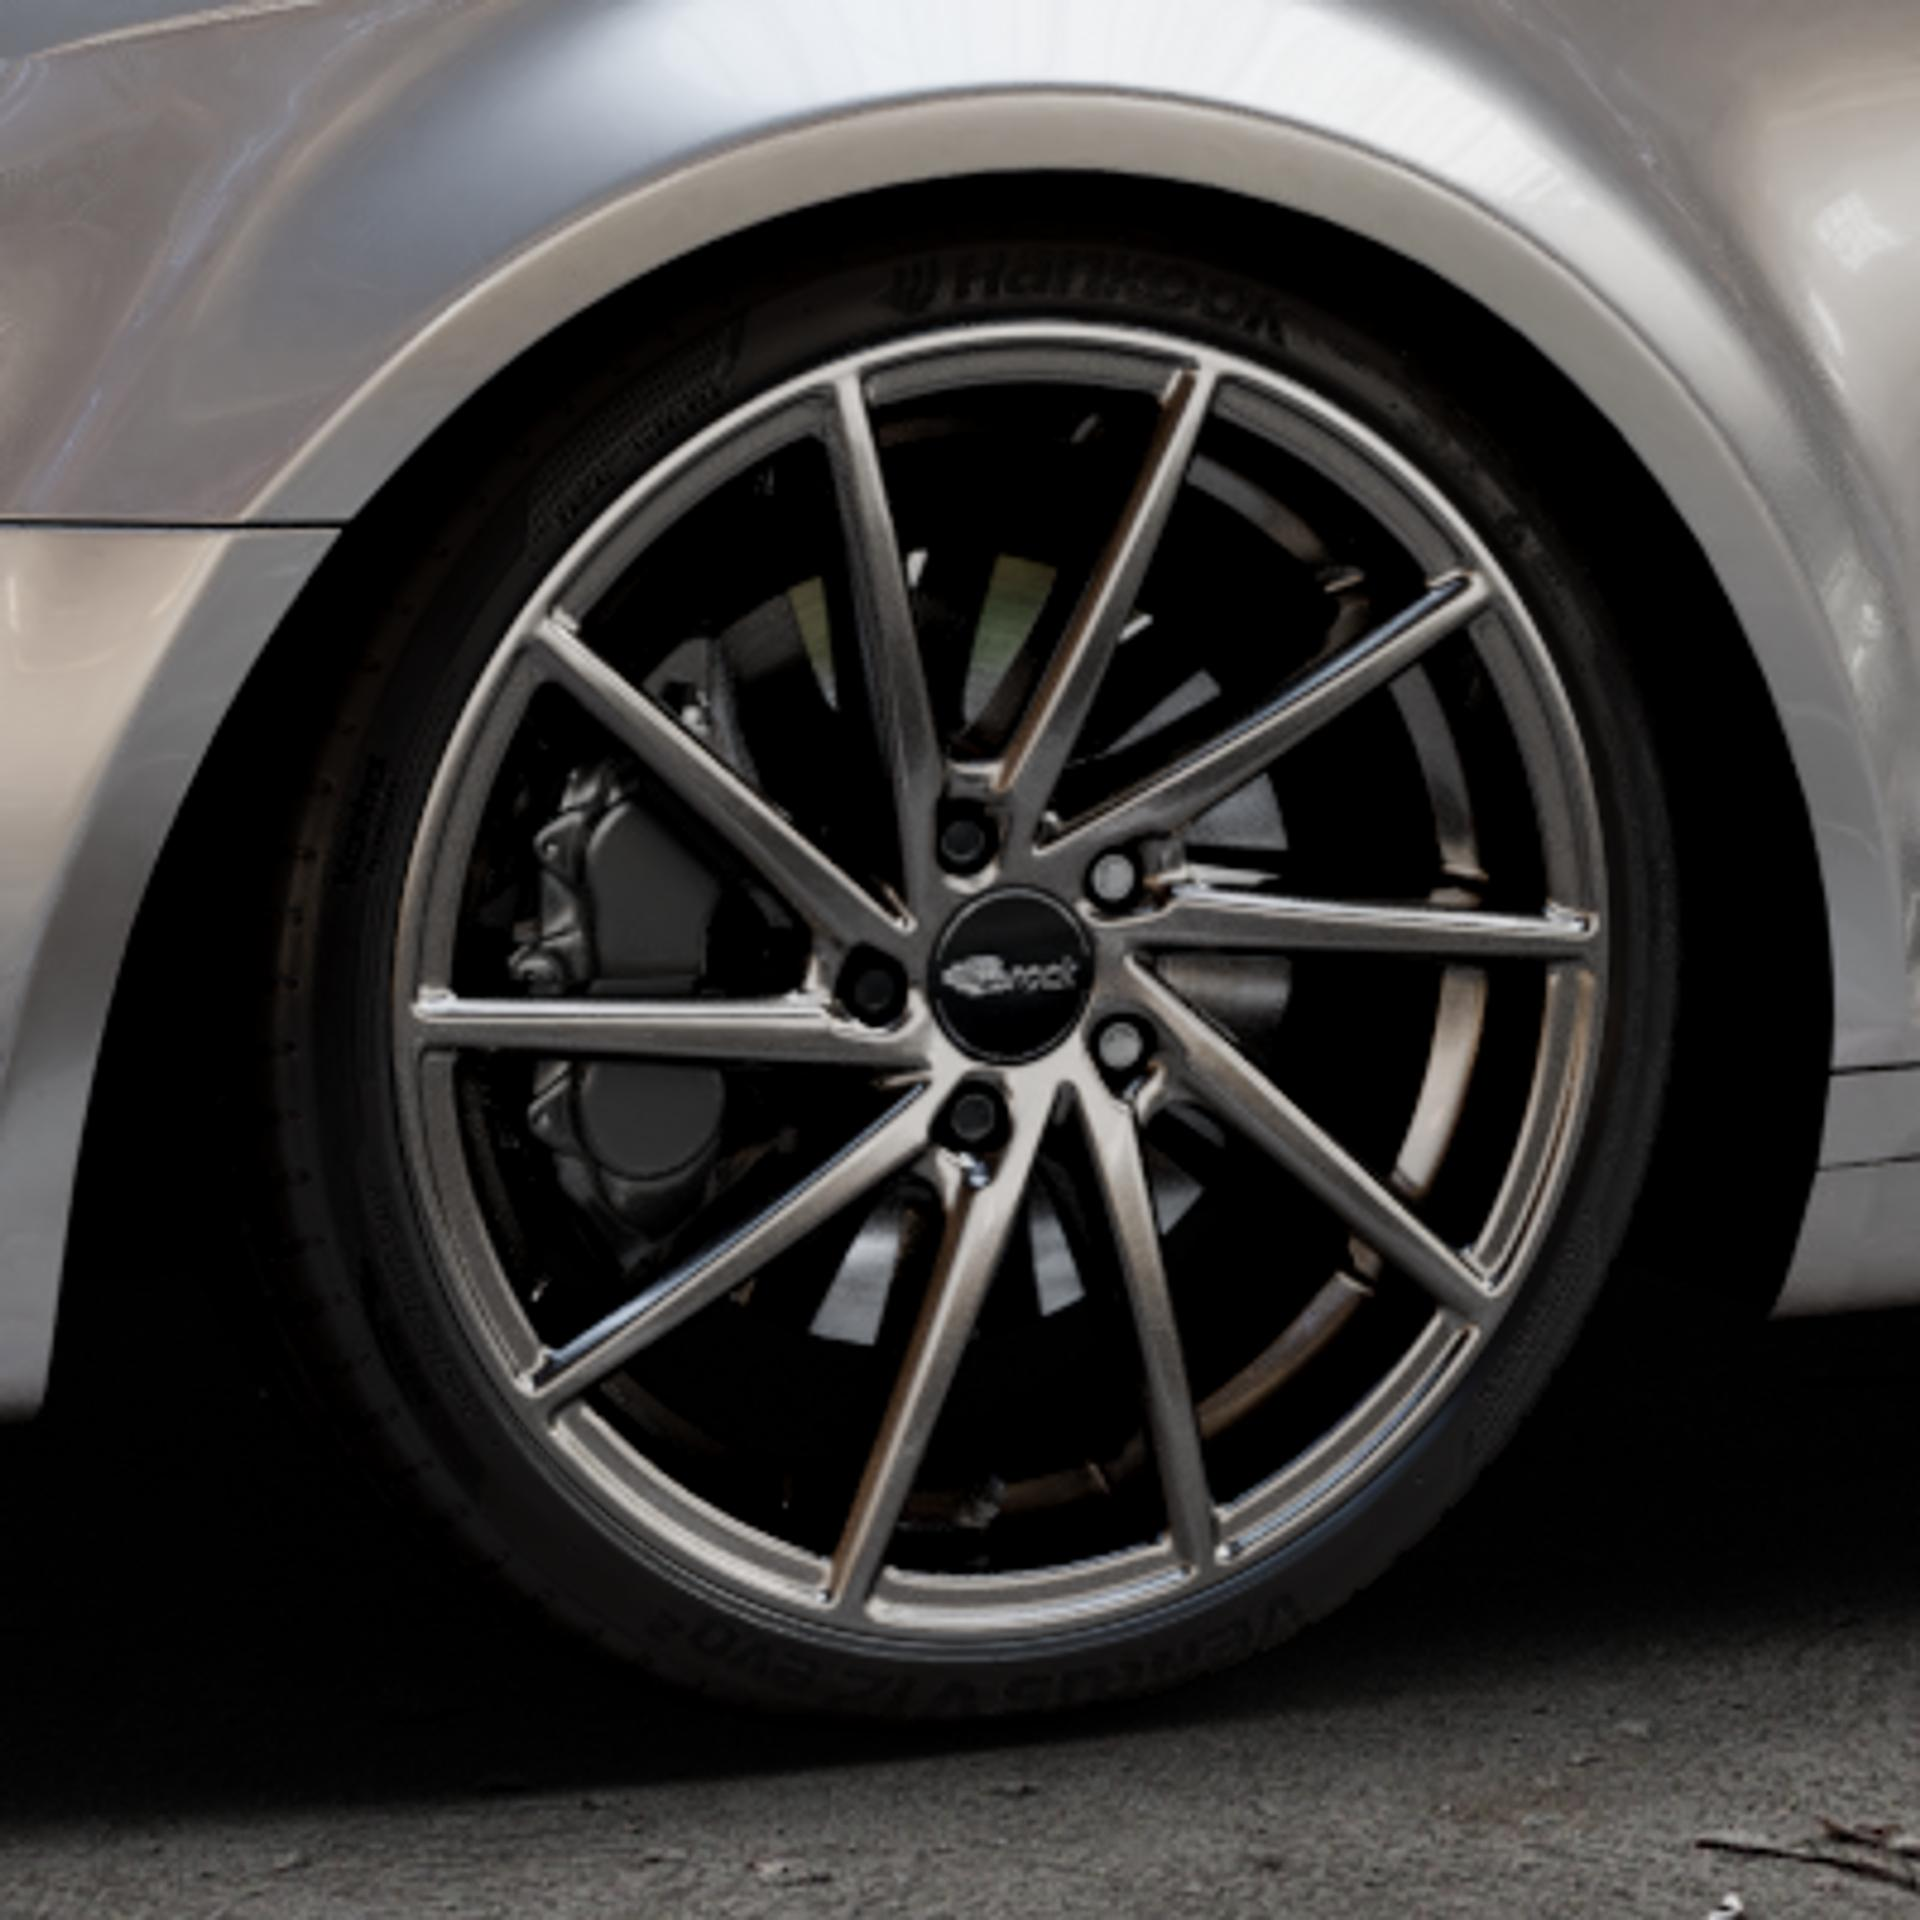 Brock B37 dark-sparkle lackiert Felge mit Reifen grau in 19Zoll Winterfelge Alufelge auf silbernem Audi A3 Typ 8P (Sportback) 1,6l 75kW (102 PS) 2,0l FSI 110kW (150 1,9l TDI 77kW (105 103kW (140 TFSI 147kW (200 85kW (116 100kW (136 1,8l 118kW (160 125kW (170 1,4l 92kW (125 120kW (163 quattro 3,2l V6 184kW (250 S3 195kW (265 1,2l 66kW (90